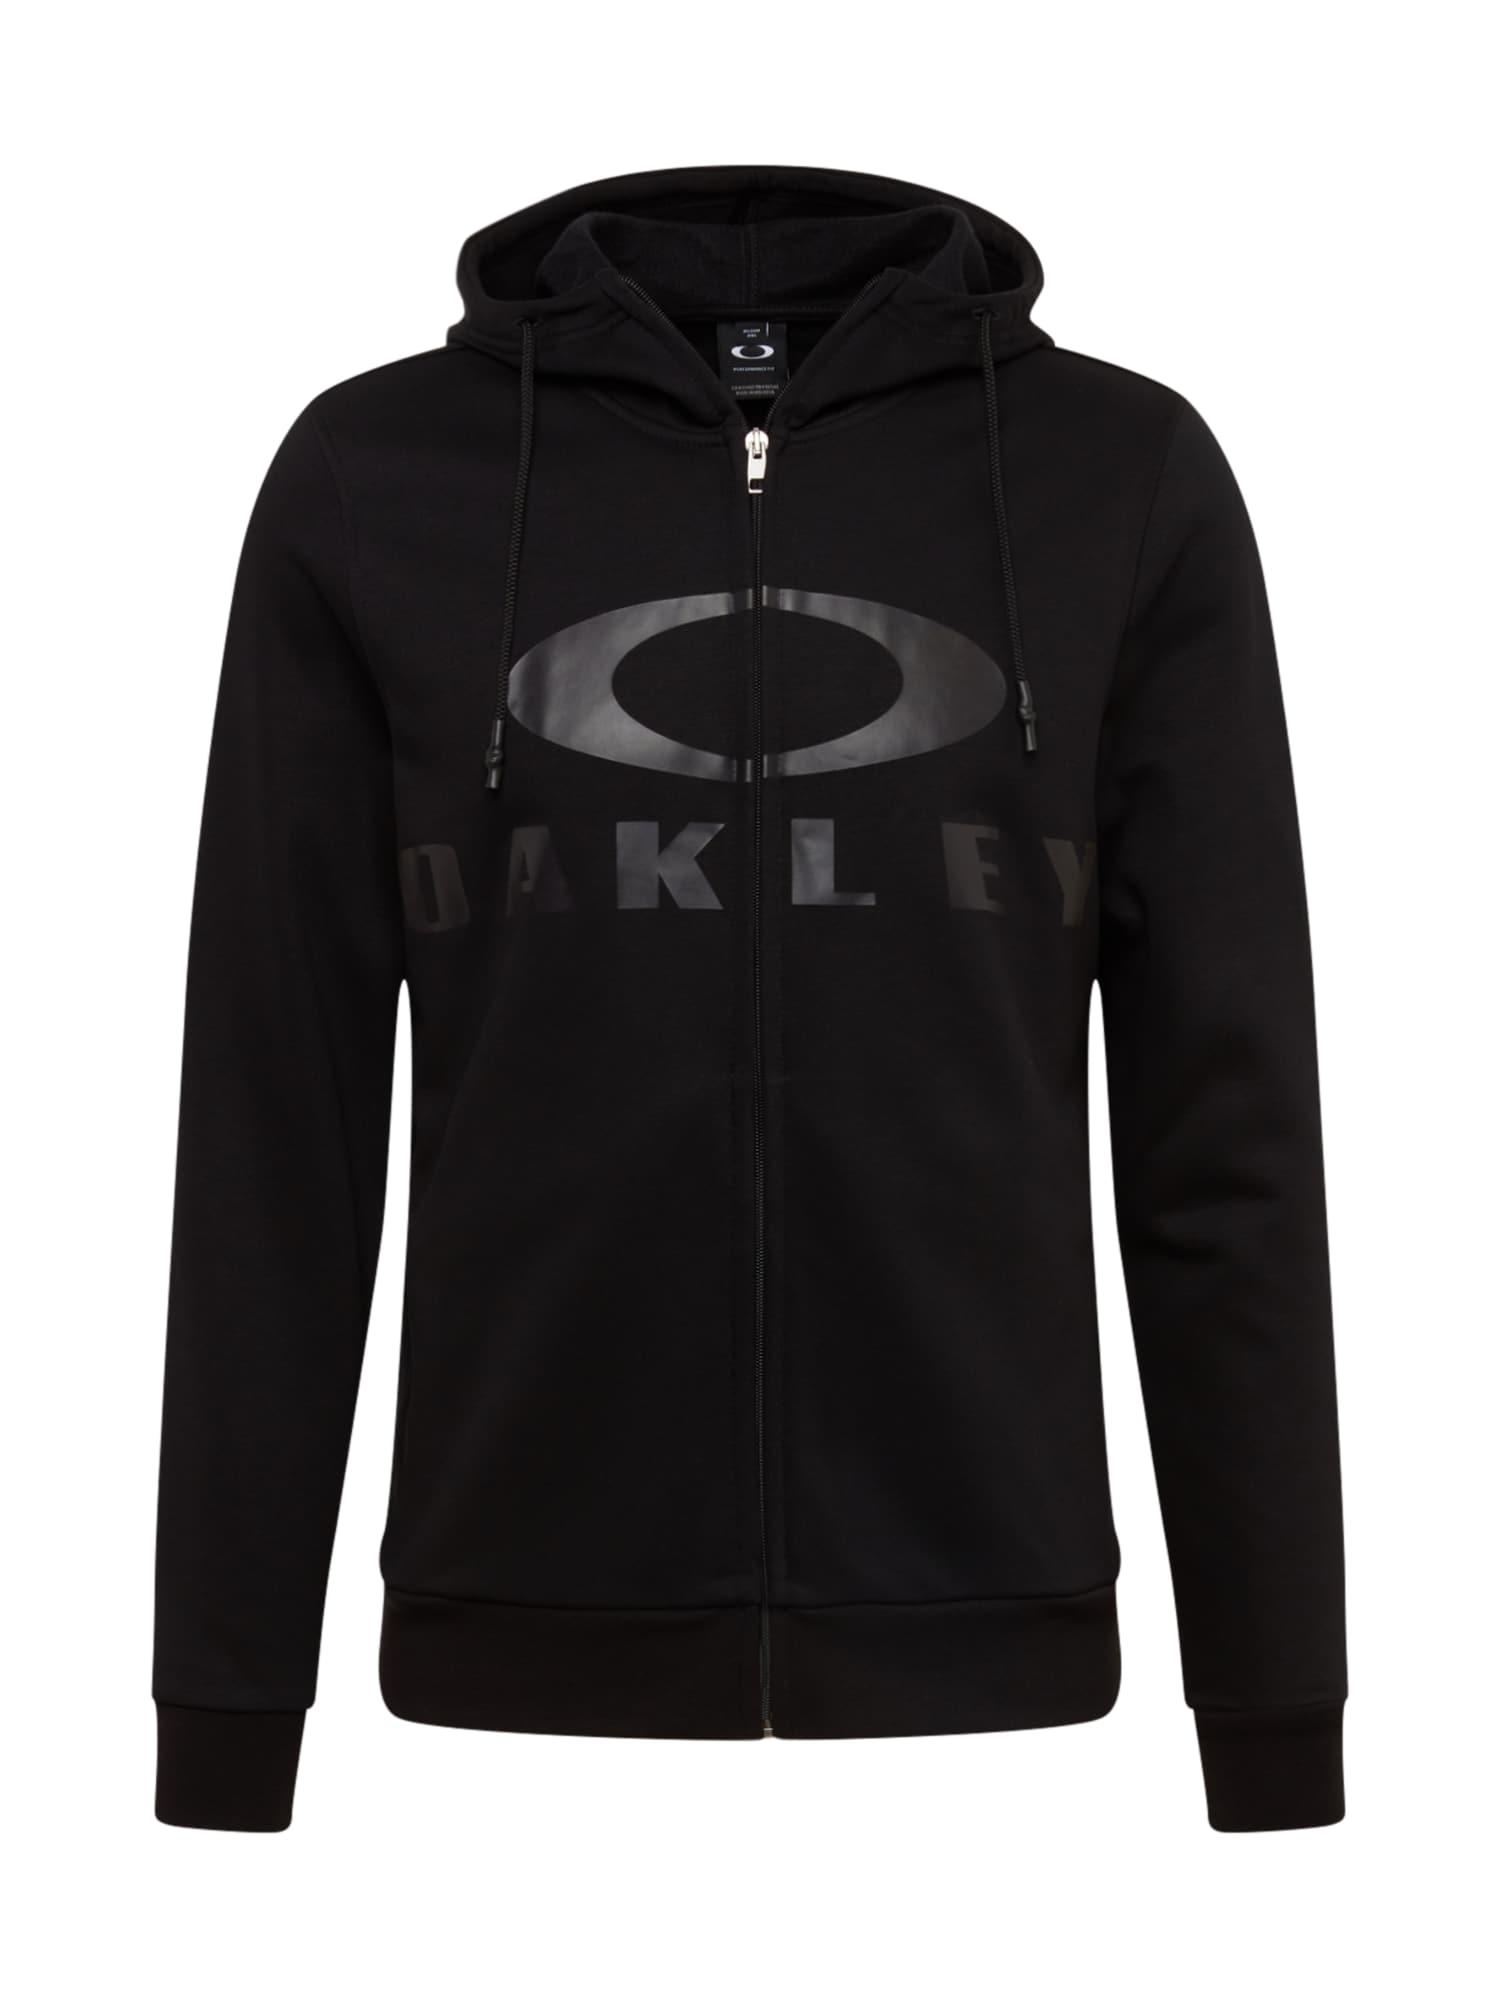 OAKLEY Sportinis džemperis juoda